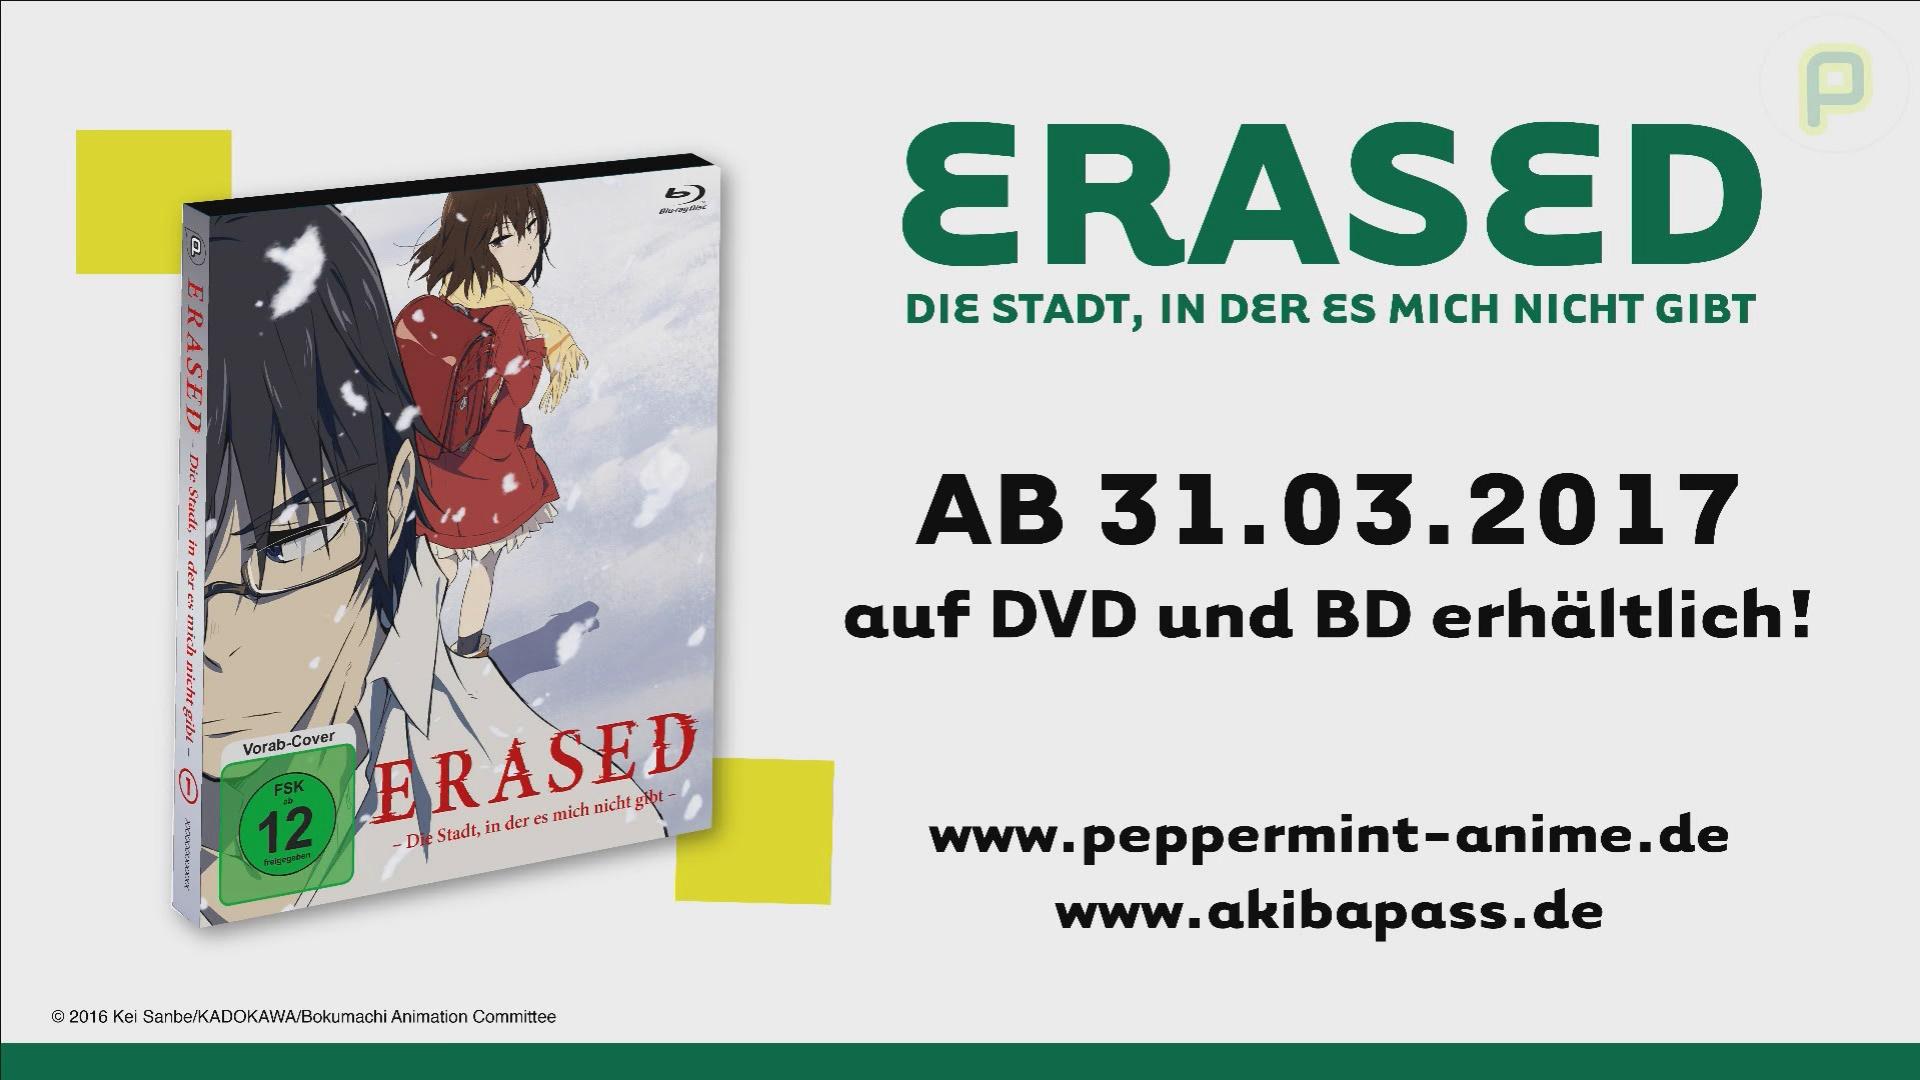 erased proxer